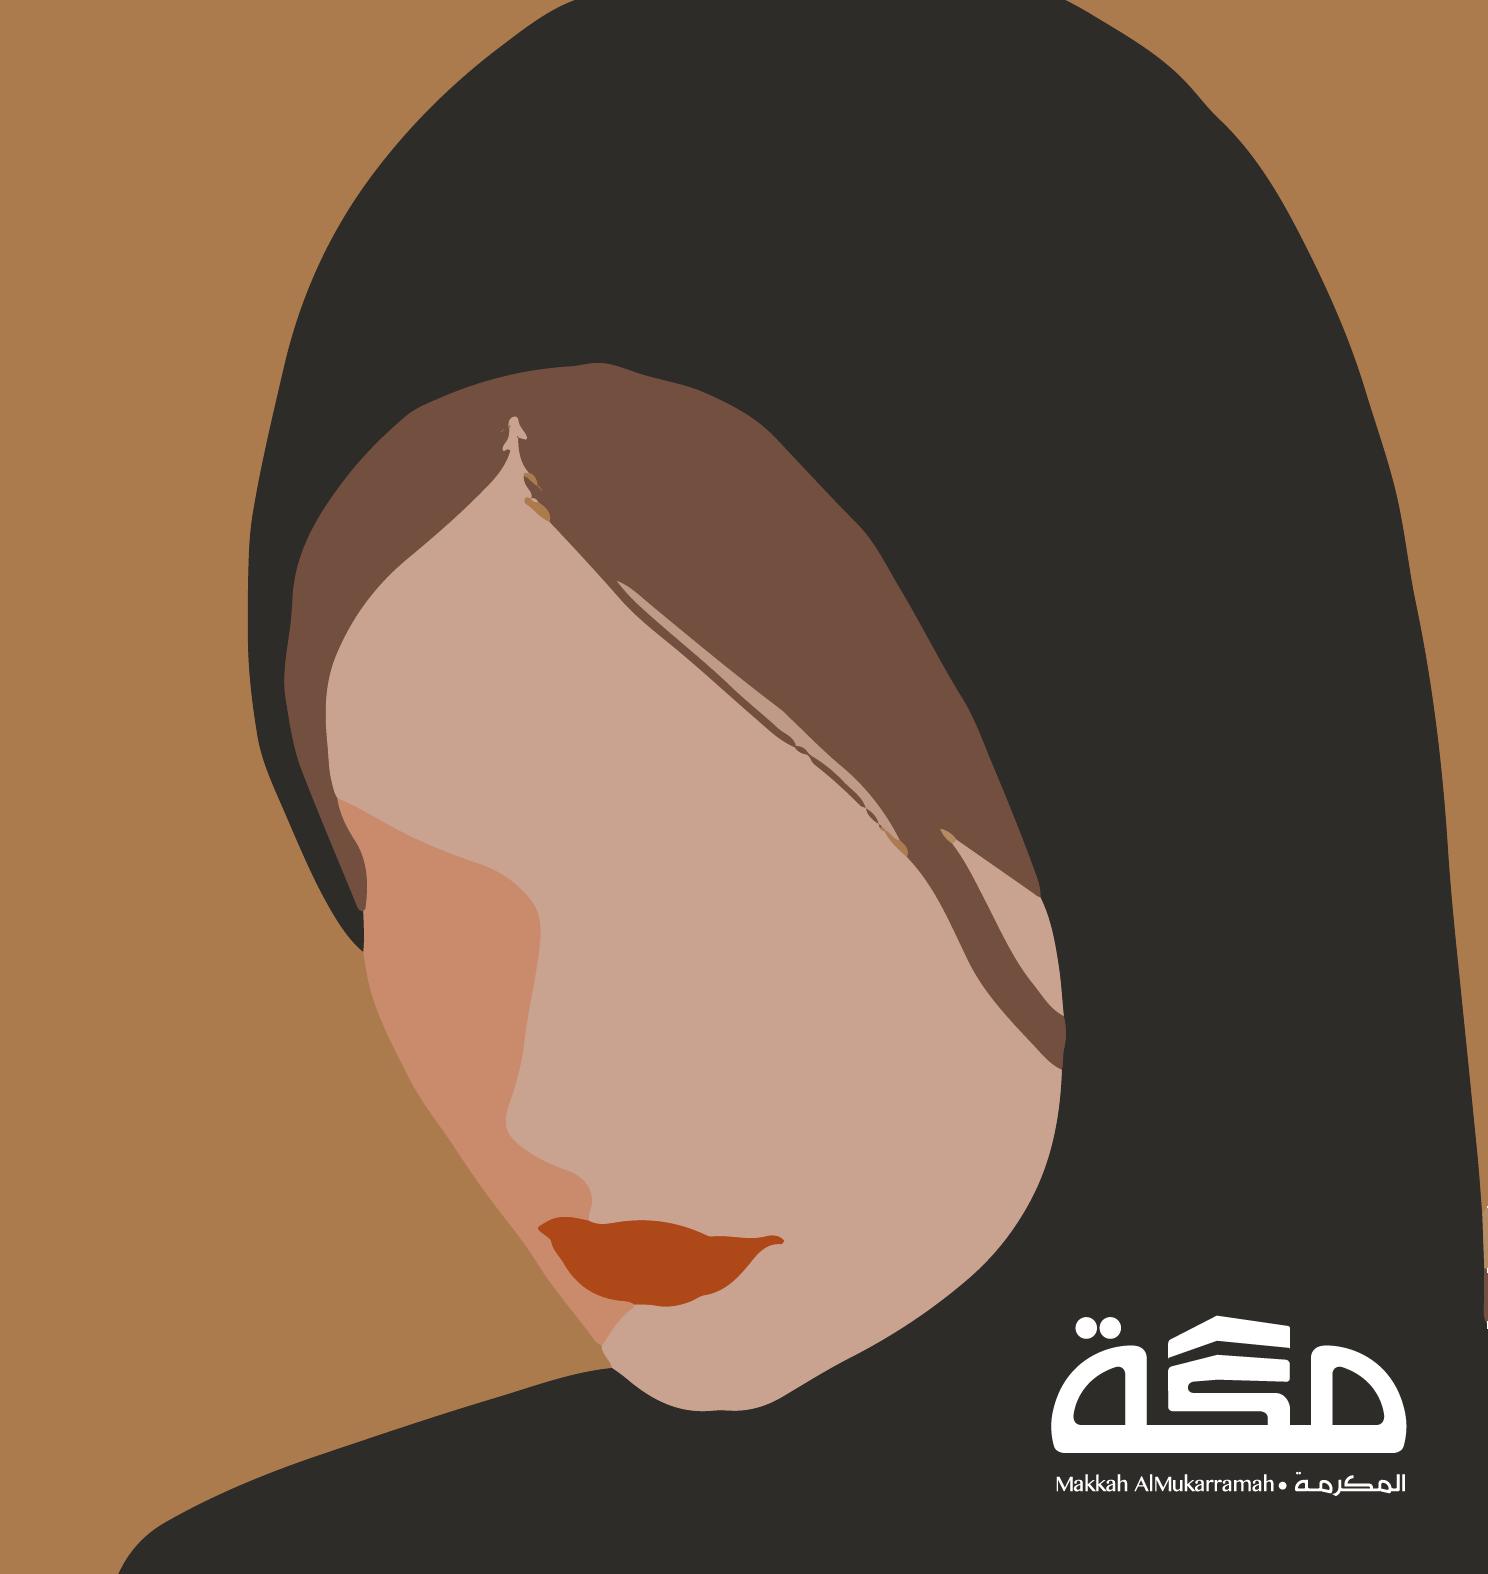 خديجة محمد بابكر